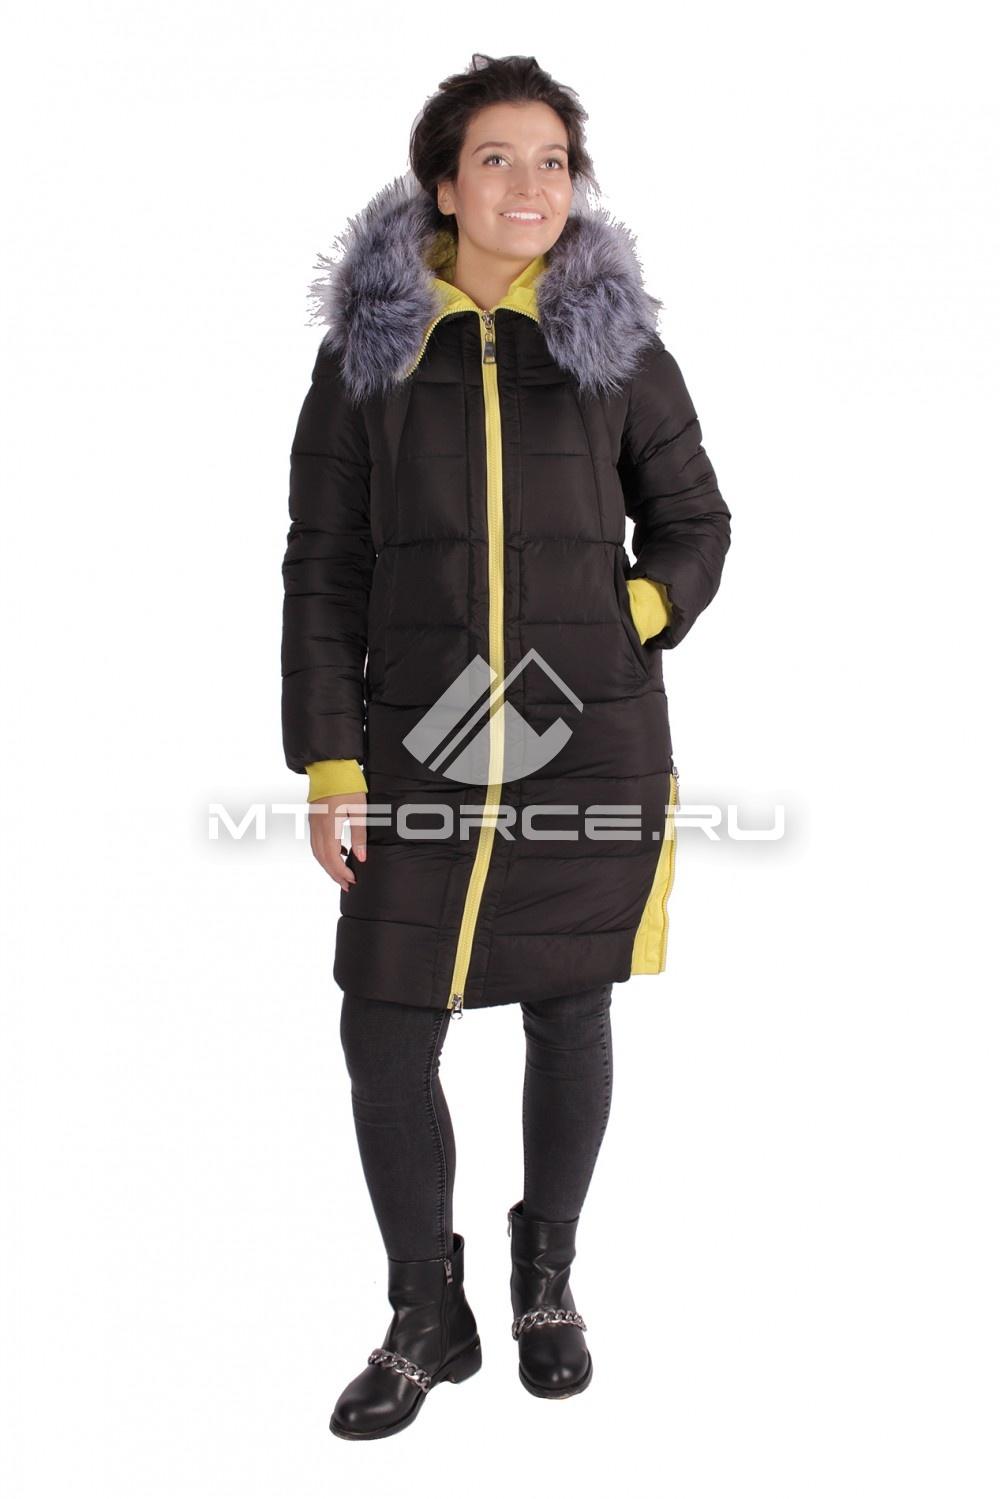 Купить                                  оптом Пуховик ТРЕНД женский зимний черного цвета 16053Ch